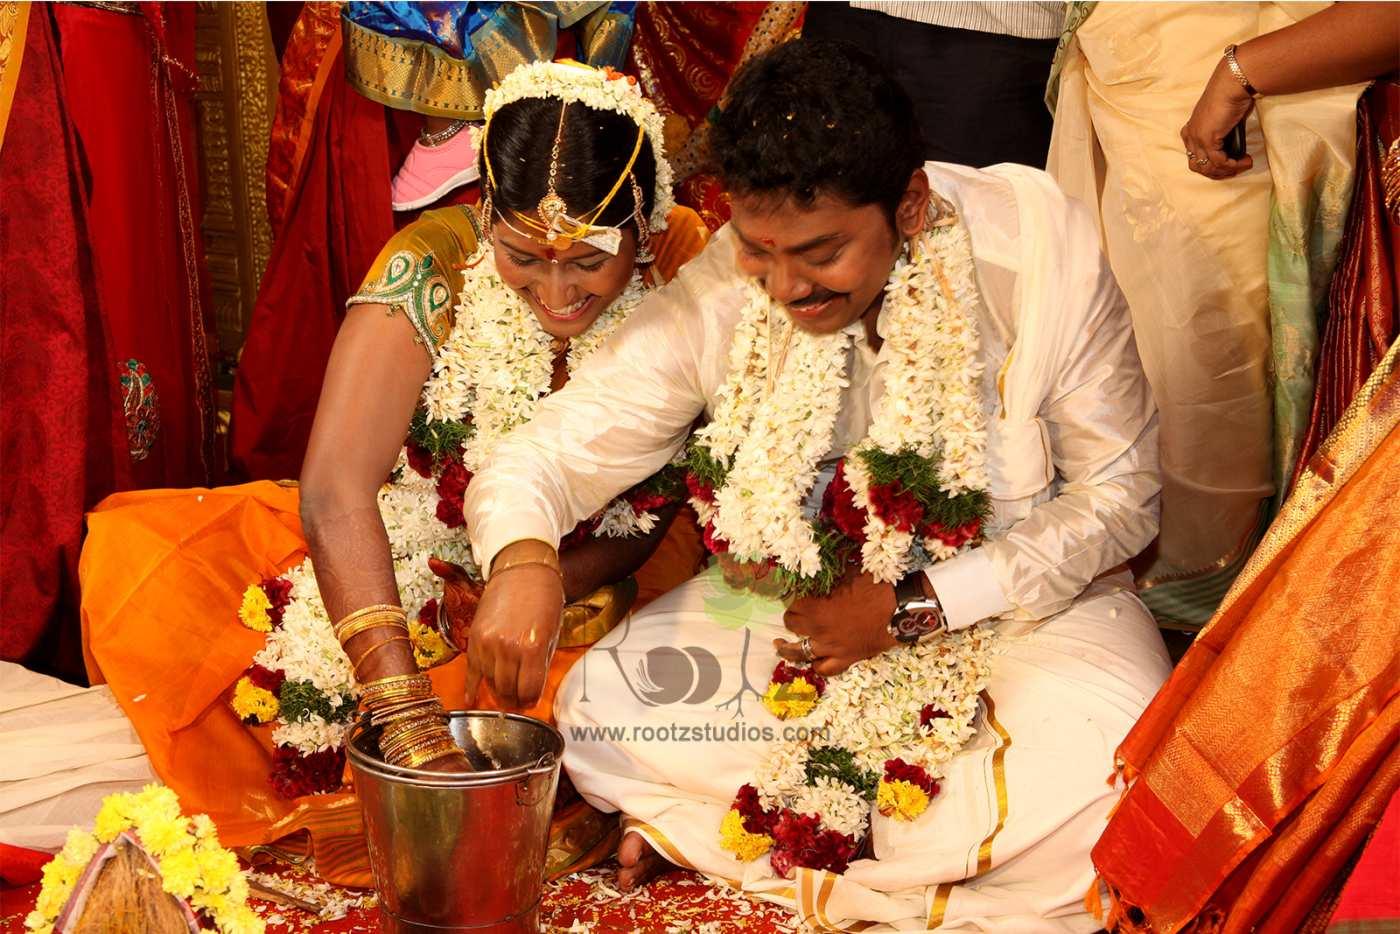 Rootz Studios, Pondicherry - Wedding Candid Photography (1)